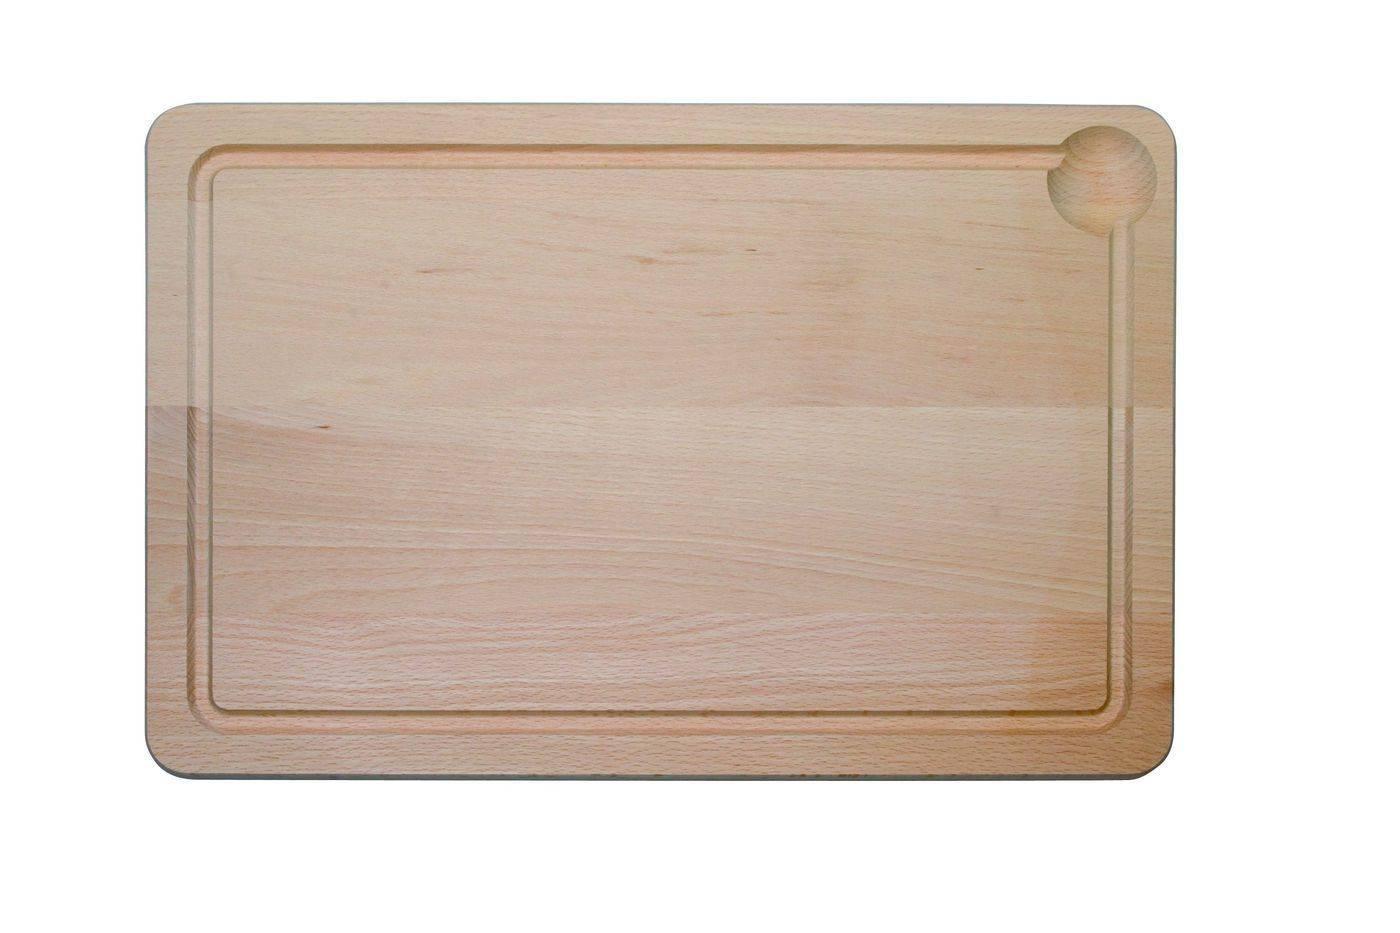 Kuchyňské prkénko s drážkou 45x30x2cm - Dřevovýroba Otradov